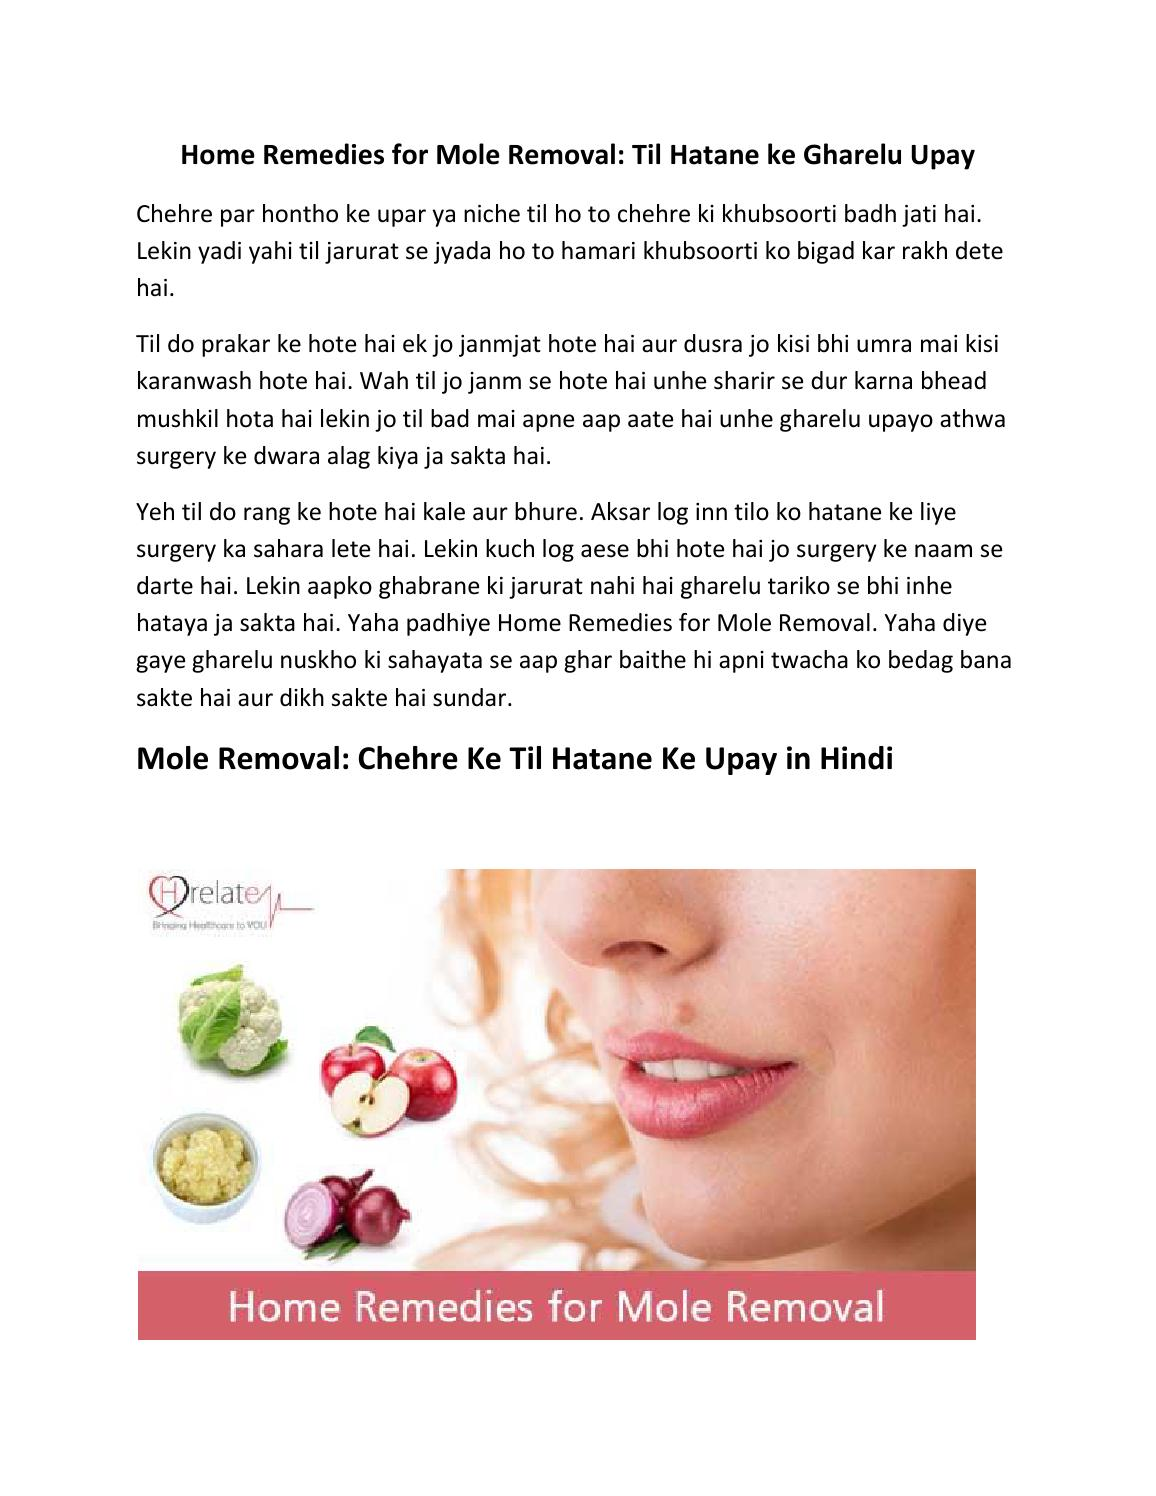 Jane Home Remedies for Mole Removal aur Hataye Chehre Se Til